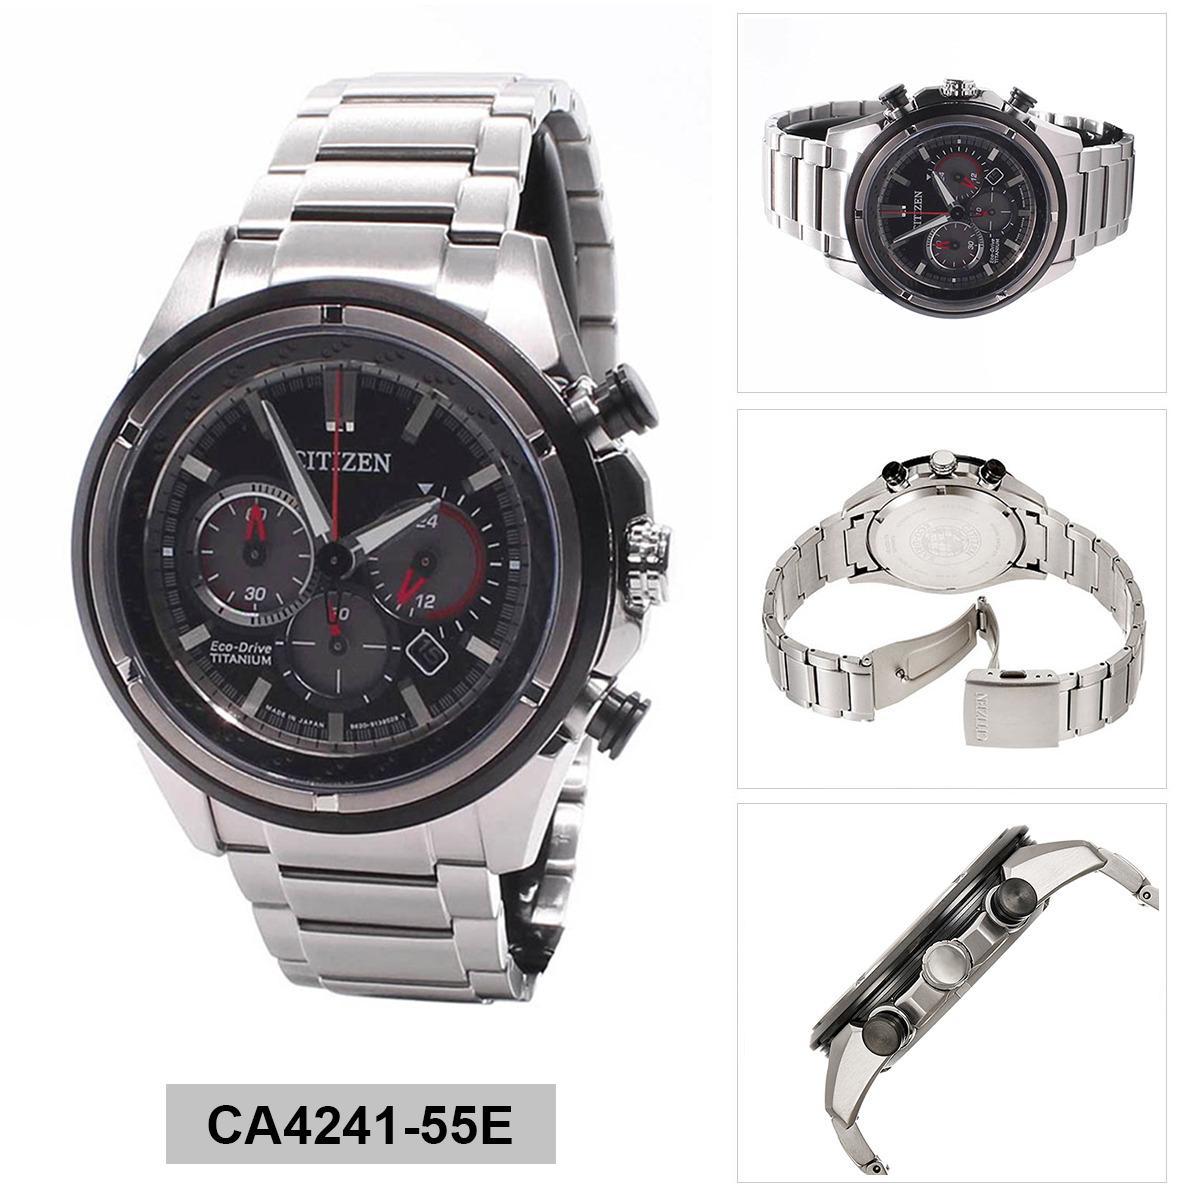 Citizen Watches For Men Black Price In Singapore Ca4285 50h Eco Drive Chronograph Silver Titanium Case Bracelet Mens Ca4241 55e